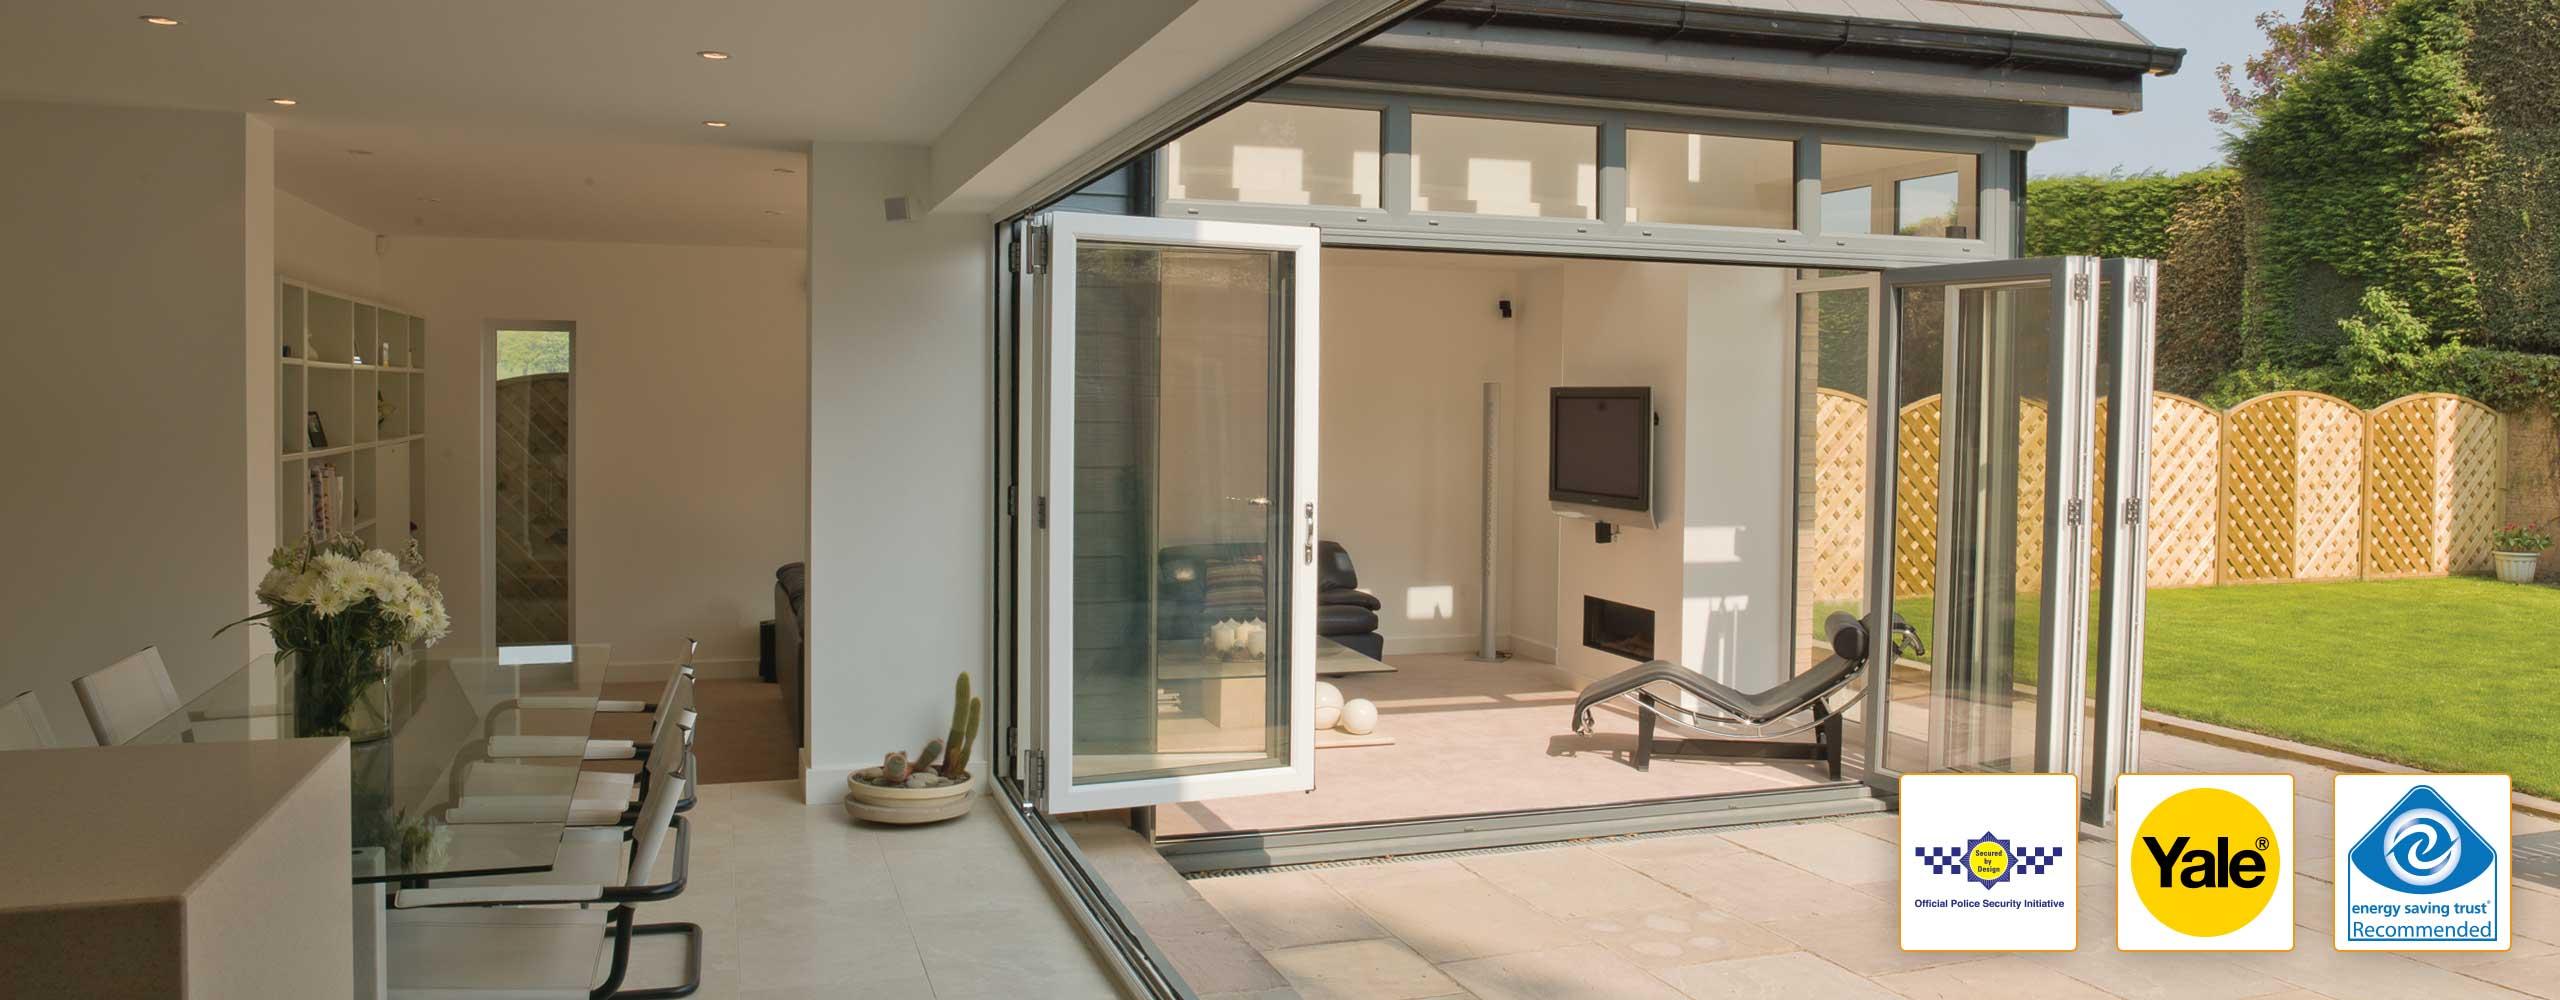 Double Glazing Home Improvements